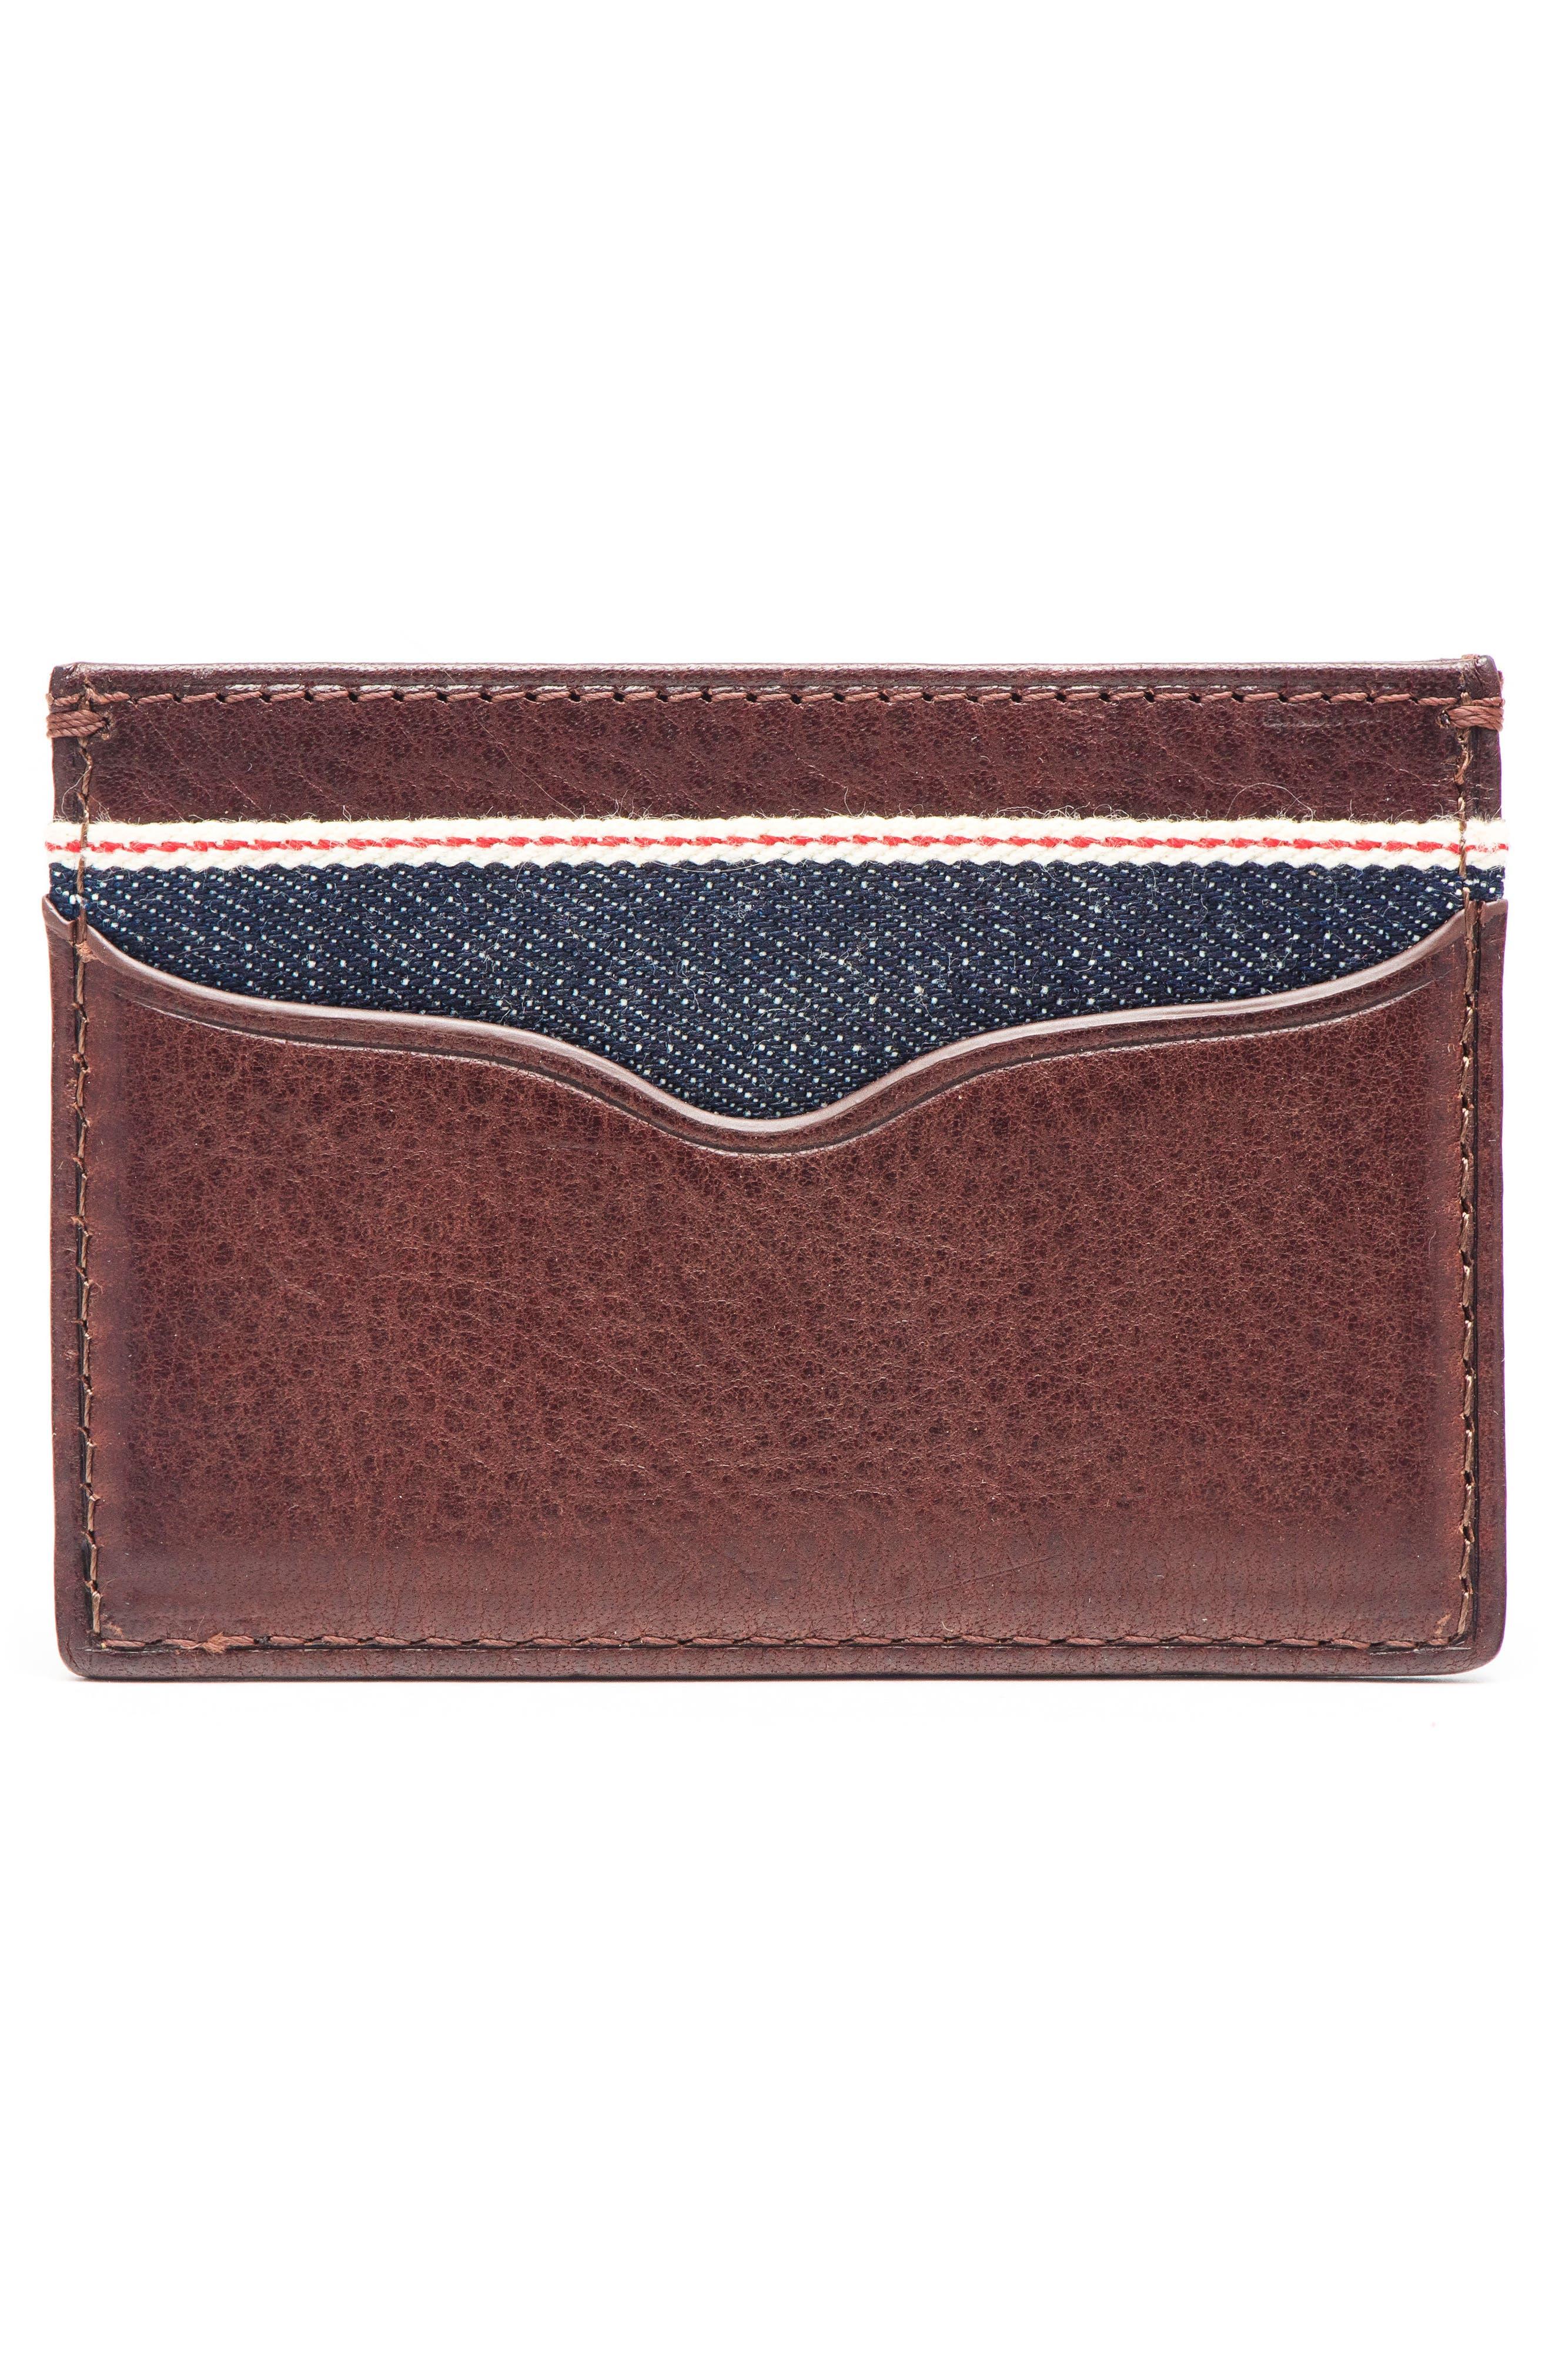 Leather & Denim Card Case,                             Alternate thumbnail 2, color,                             200